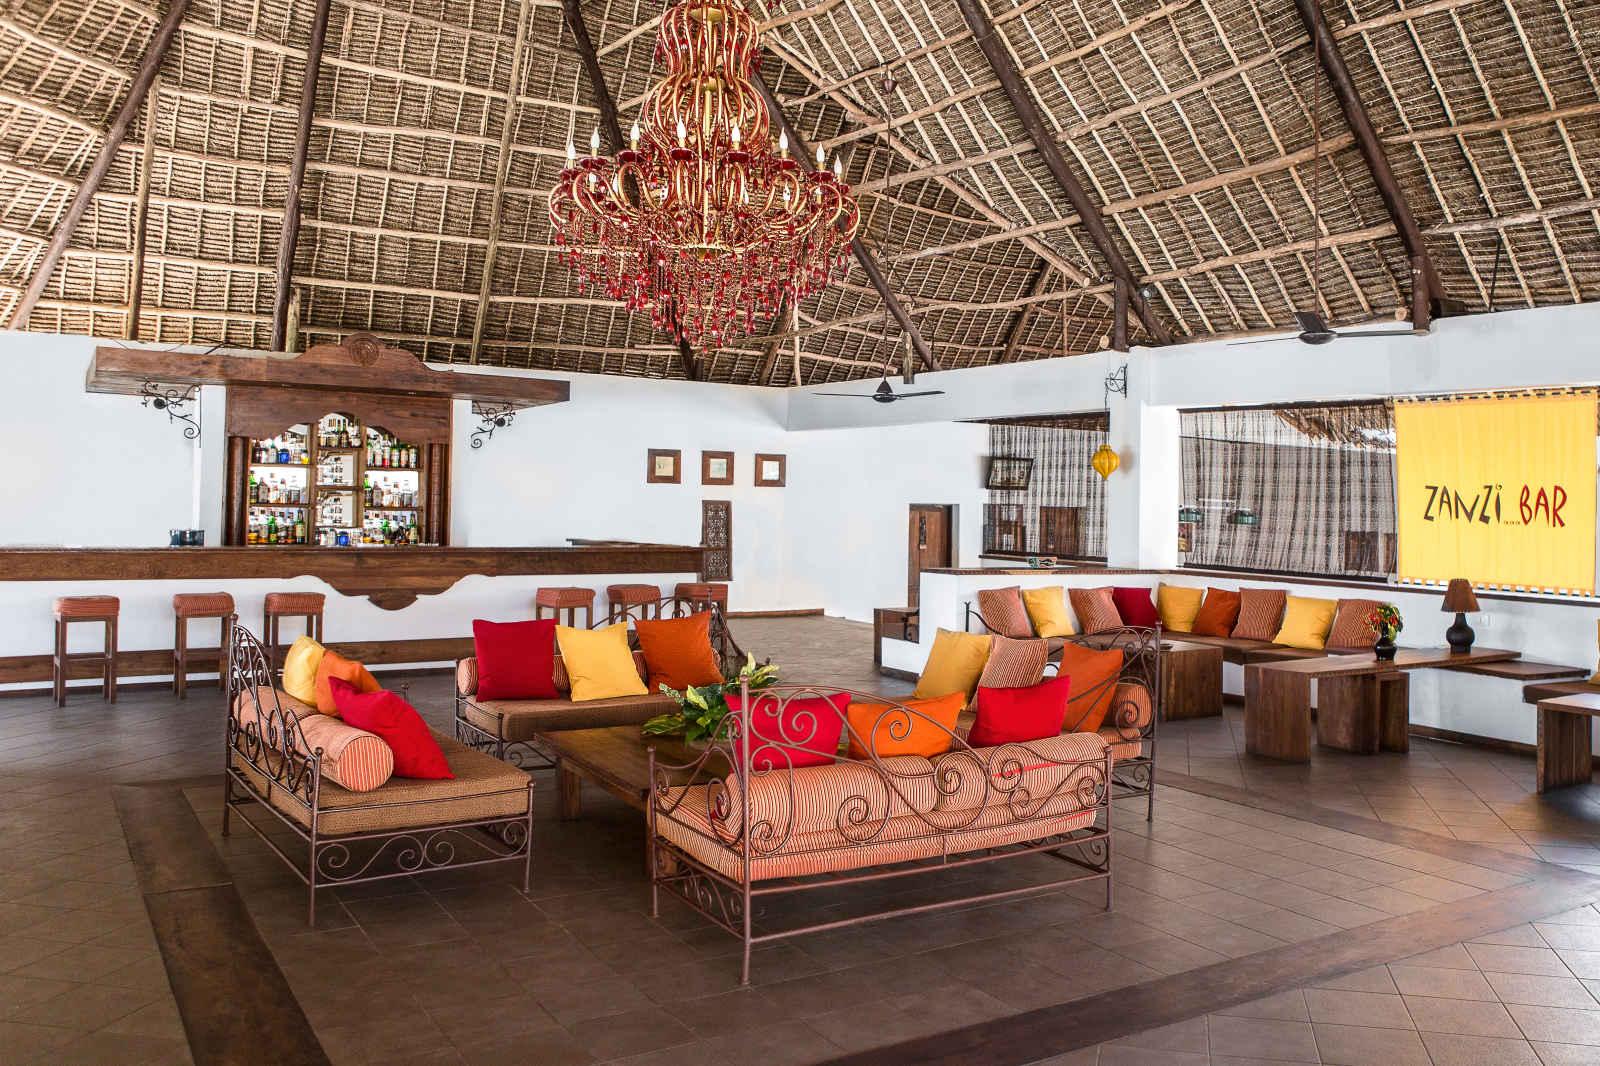 Tanzanie - Zanzibar - Hôtel Karafuu Beach Resort & Spa 5*